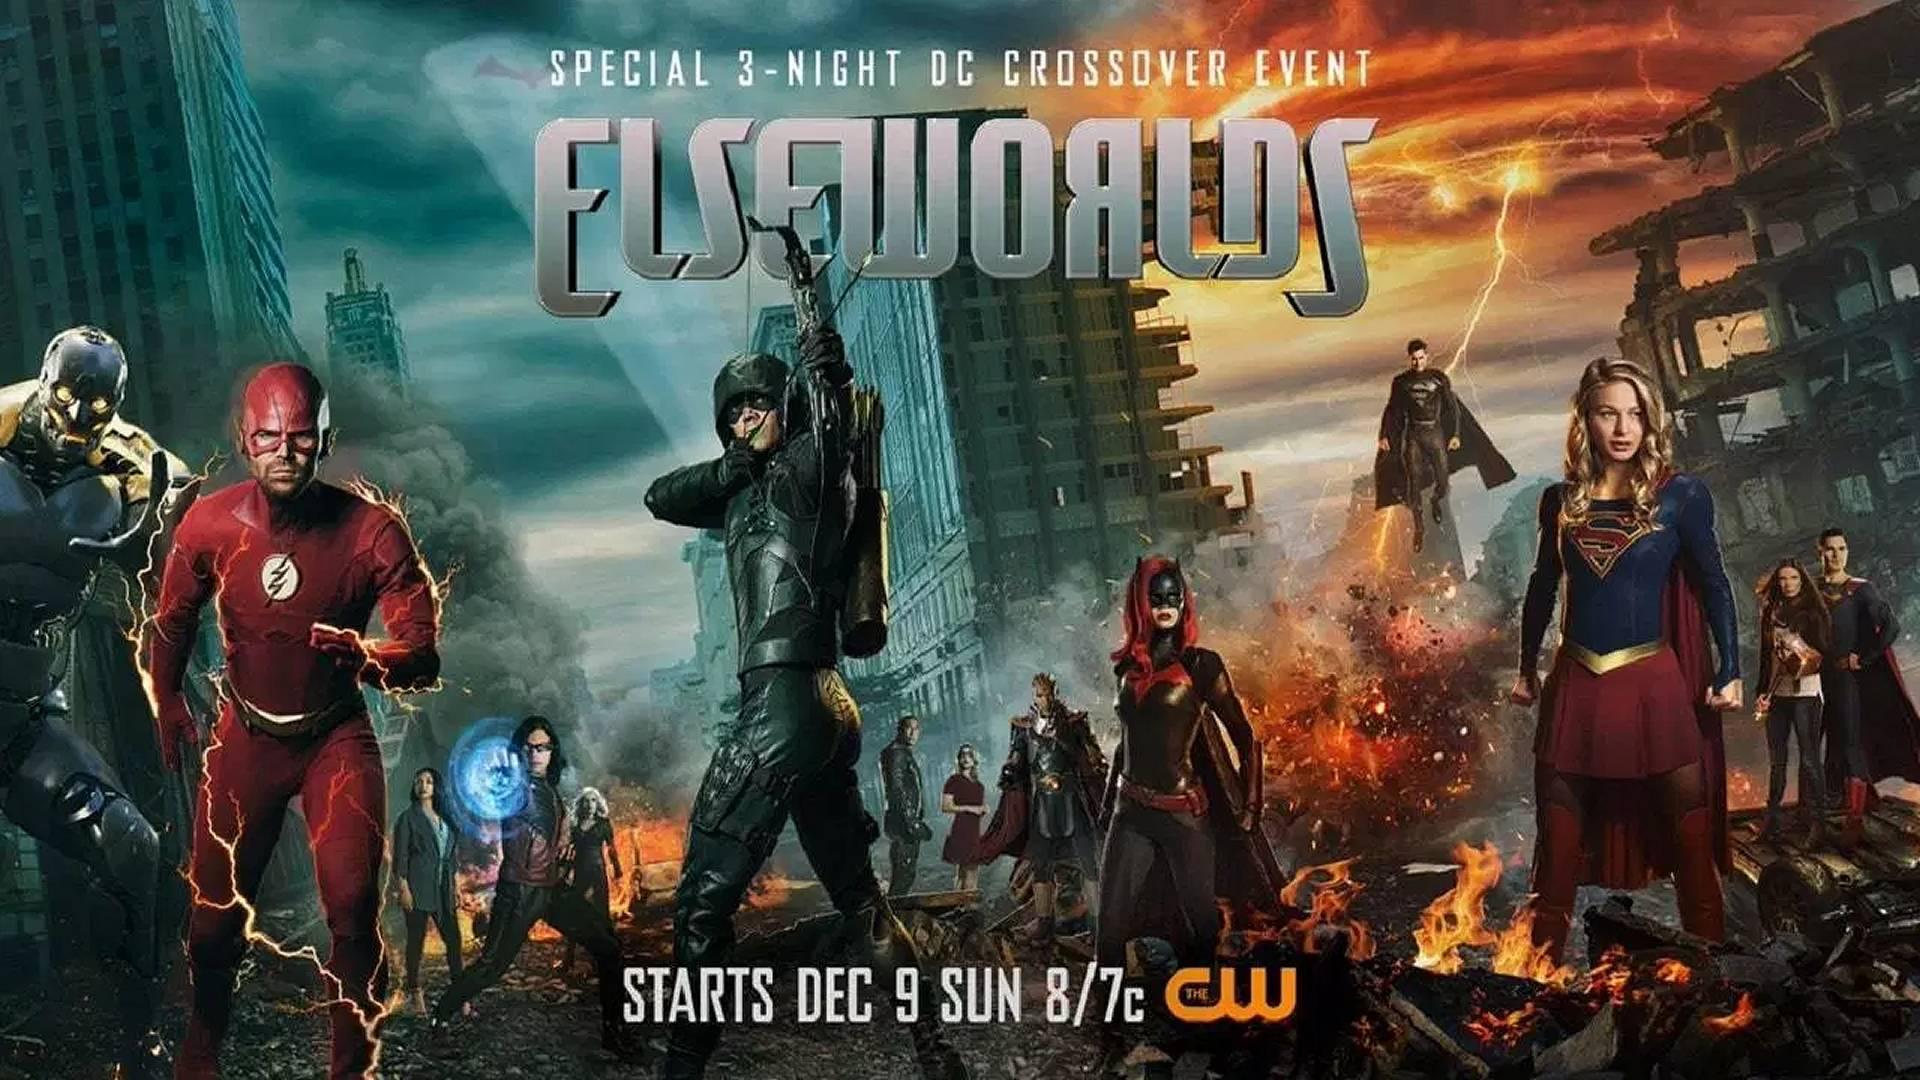 Elseworld